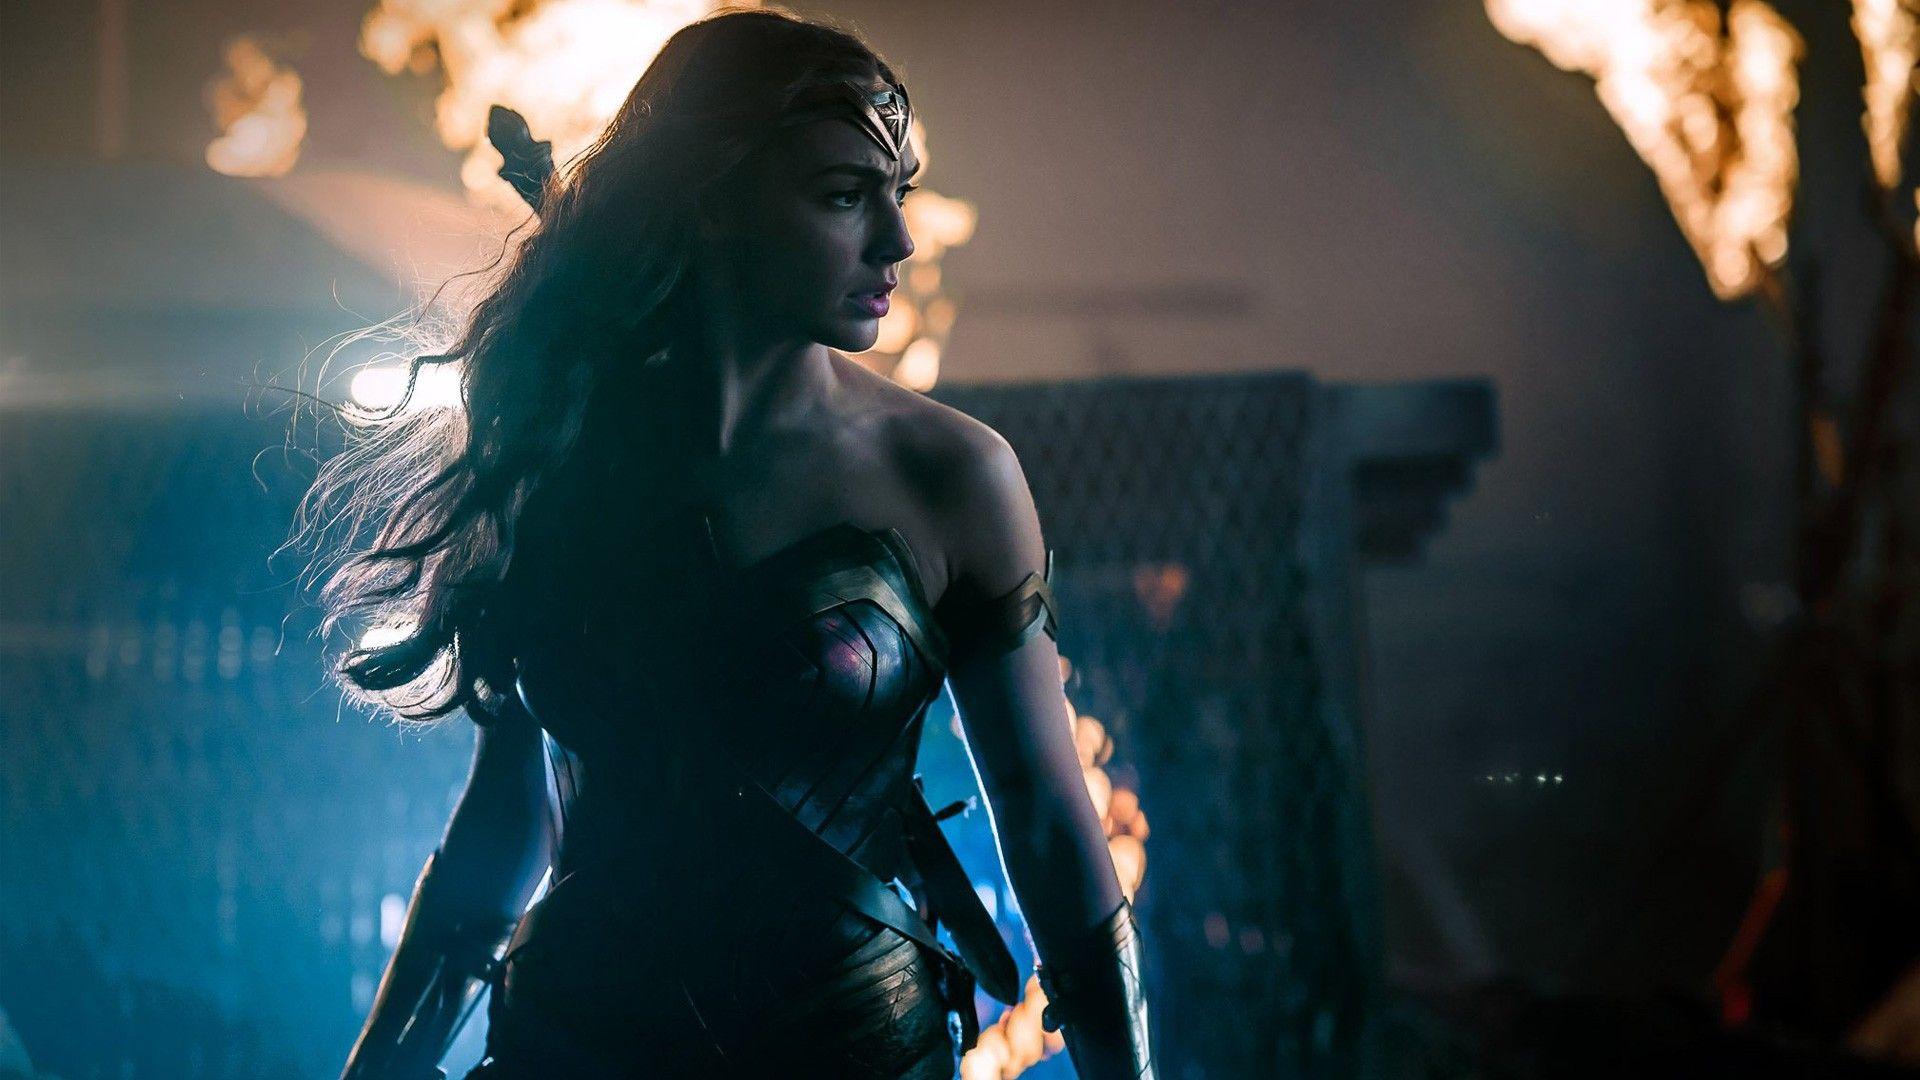 Gal Gadot in Wonder Woman Live HD Wallpapers 1920x1080